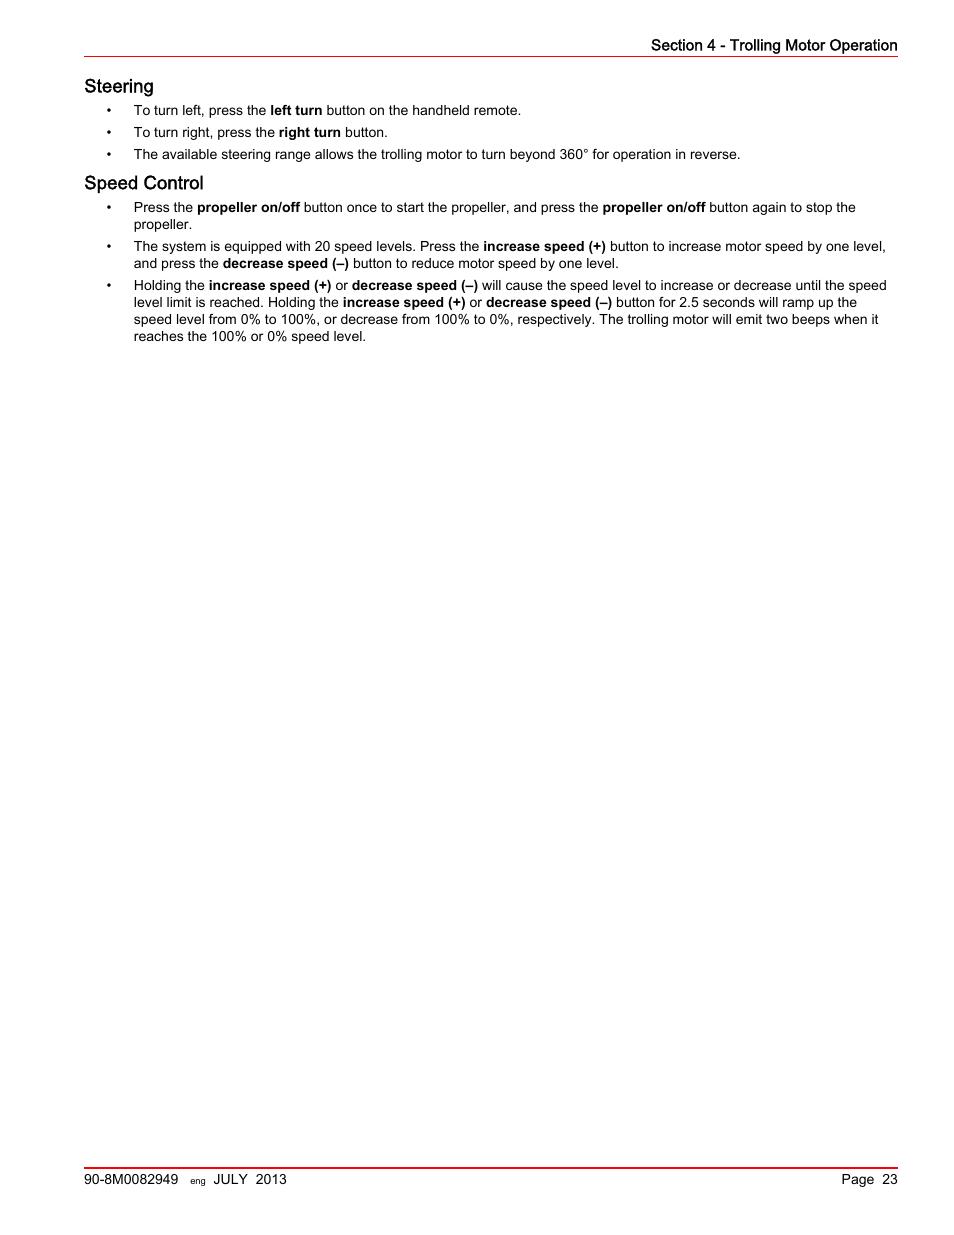 Motorguide Wireless W55 Manual The Emoji Wiring Diagram Mkp15701 Switch Boot Source Trolling Motor Trusted